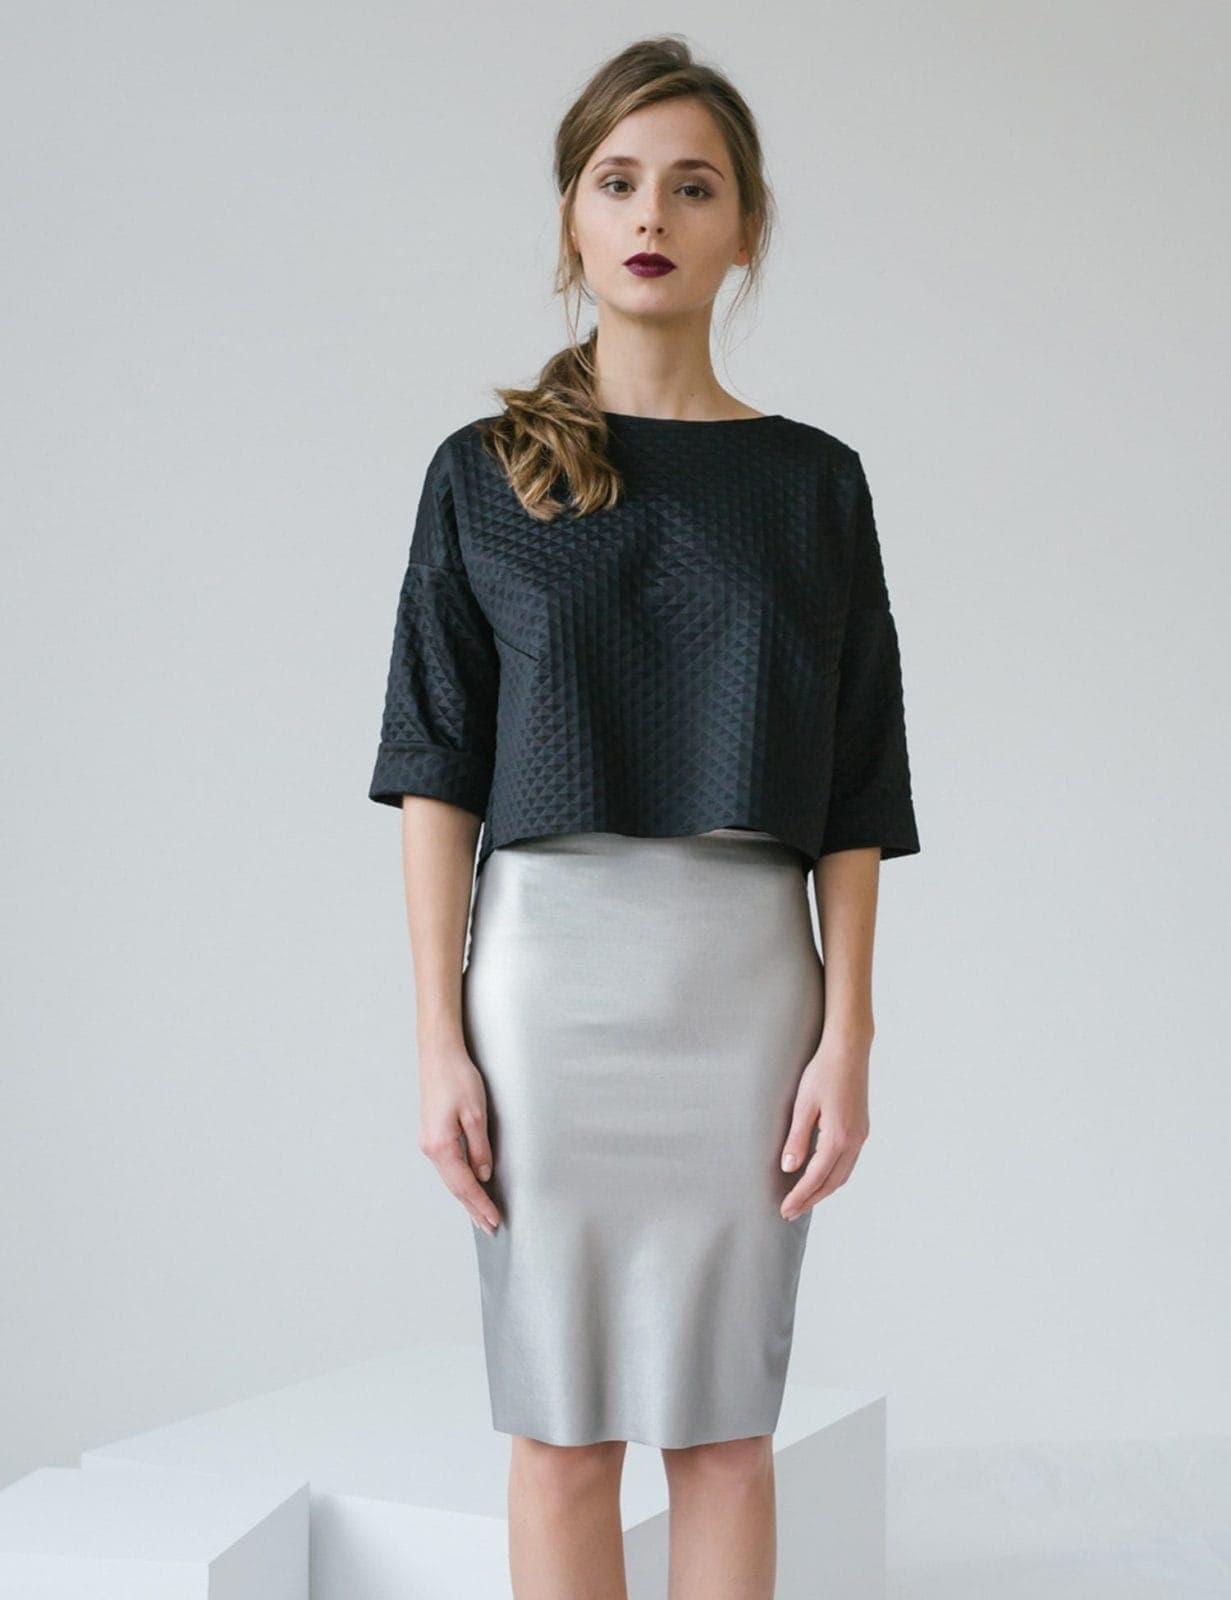 srebrna-olowkowa-spodnica-01b